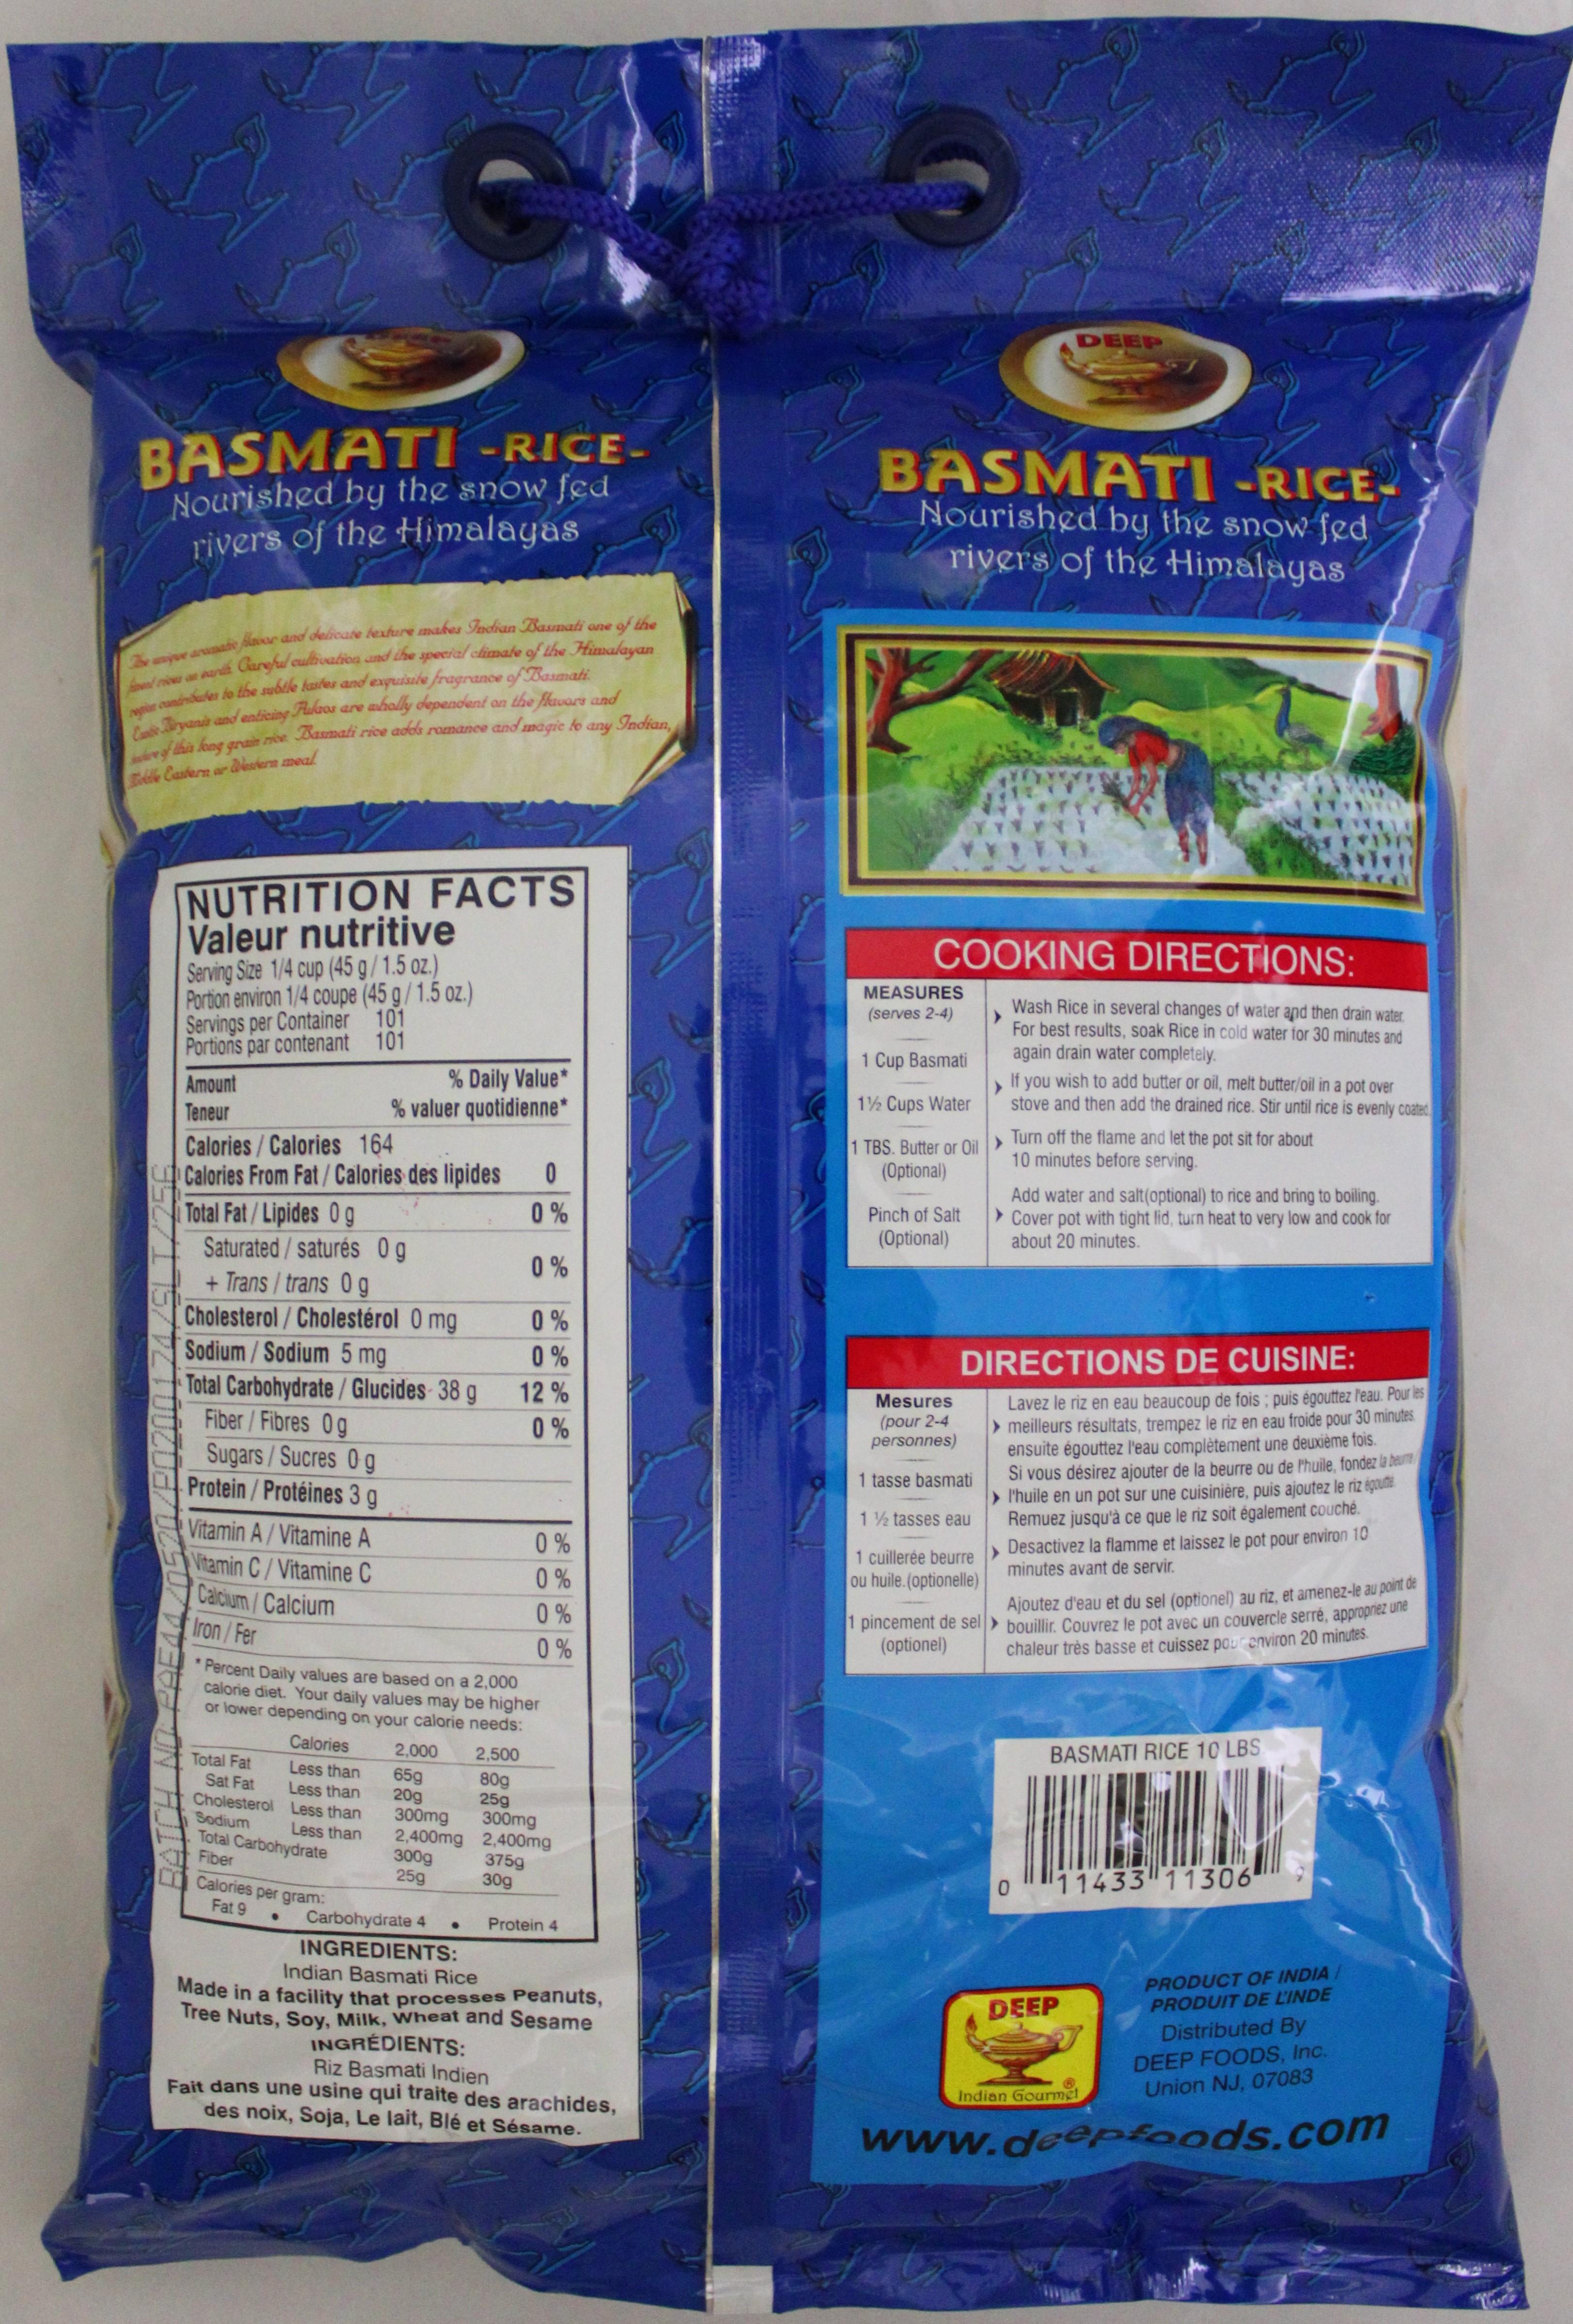 Basmati Rice 10 lbs